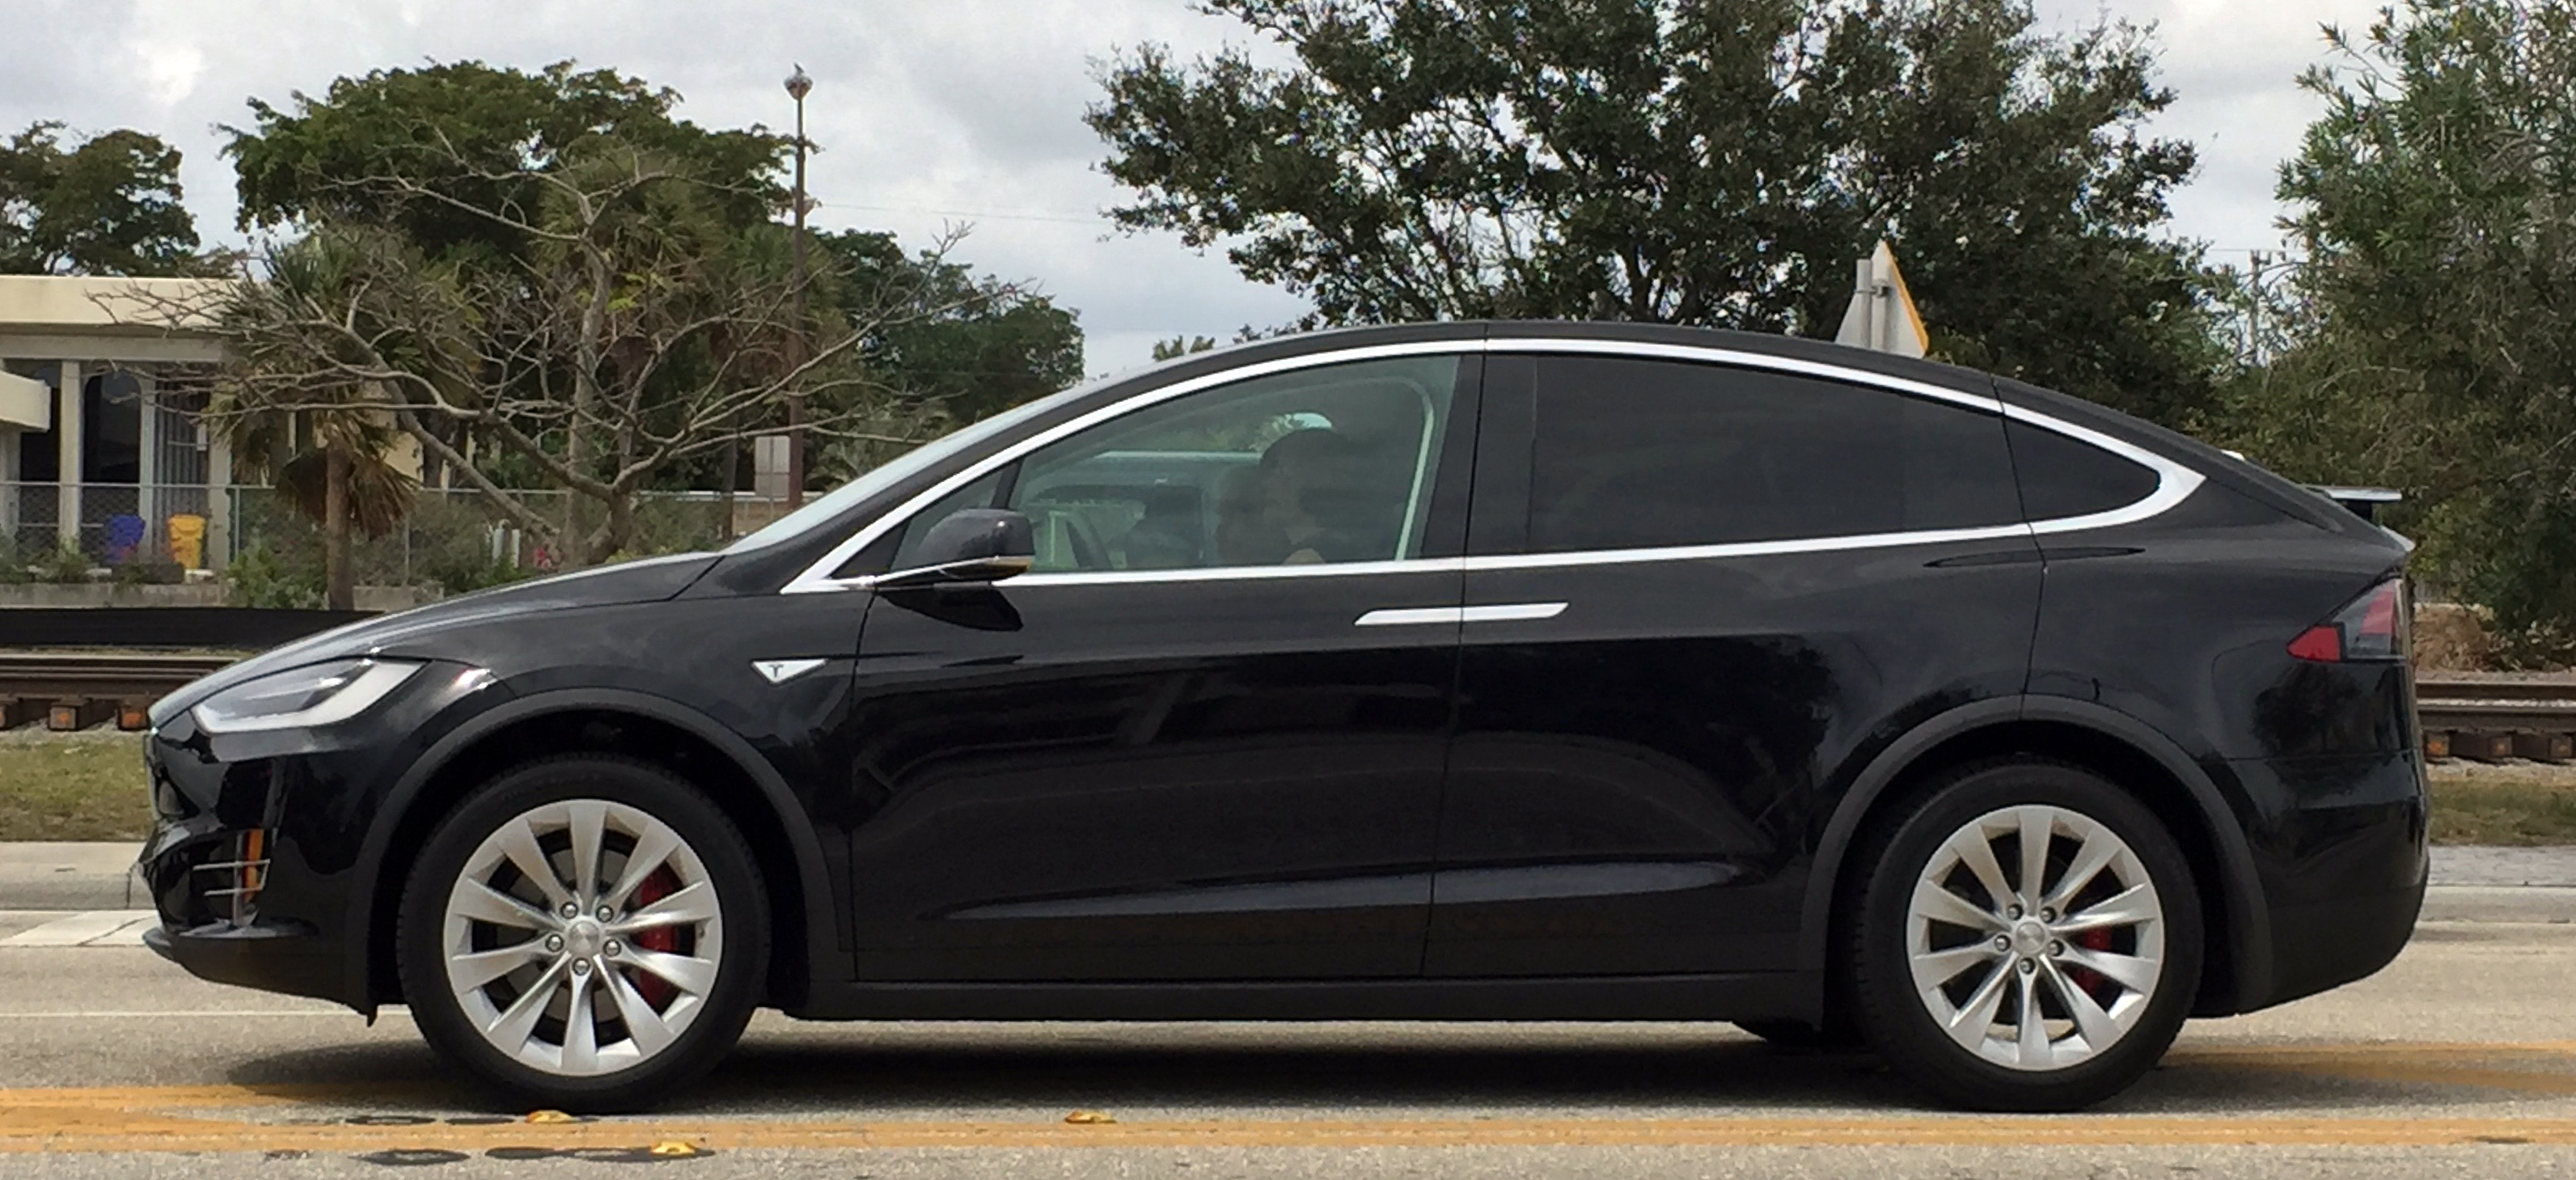 Tesla Model Y Wikipedia: File:2016 Tesla Model X In Lantana Florida 1of2.jpg